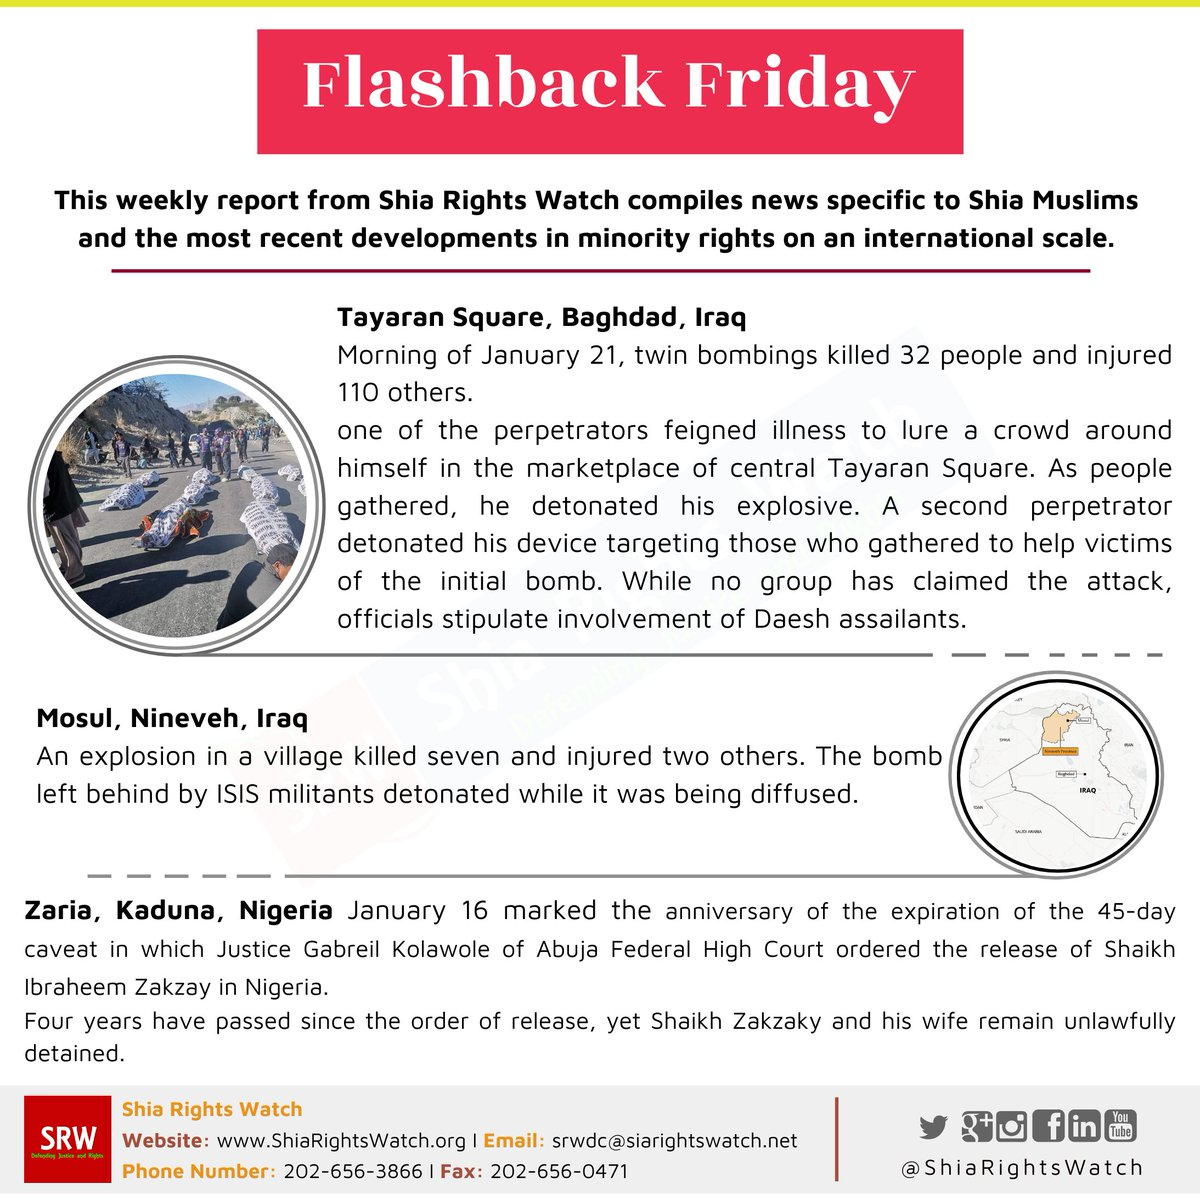 #FlashbackFriday Shia-related news in the past week Read full reports on  #MiddleEast #Iraq #Nigeria #Shia #anti-Shiism